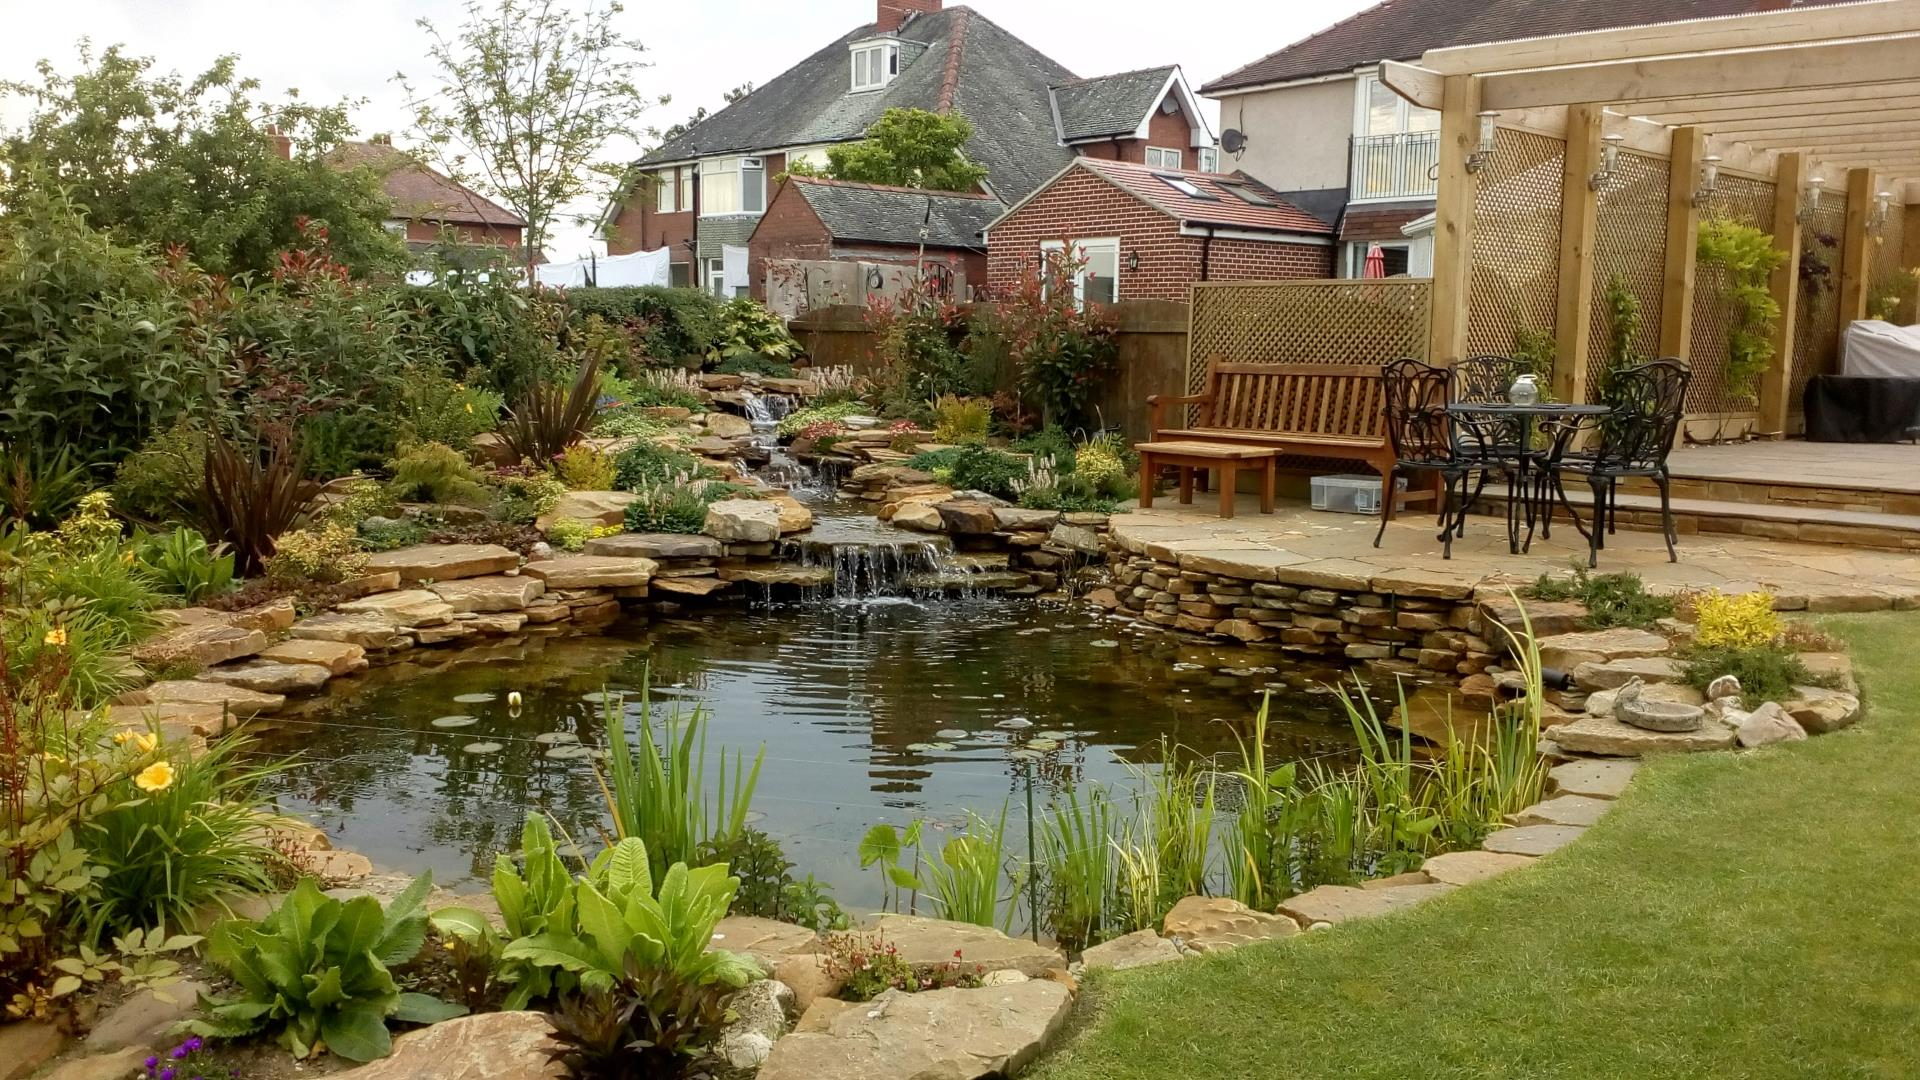 Home - Gardens Transformed - Garden and Landscape Design ...